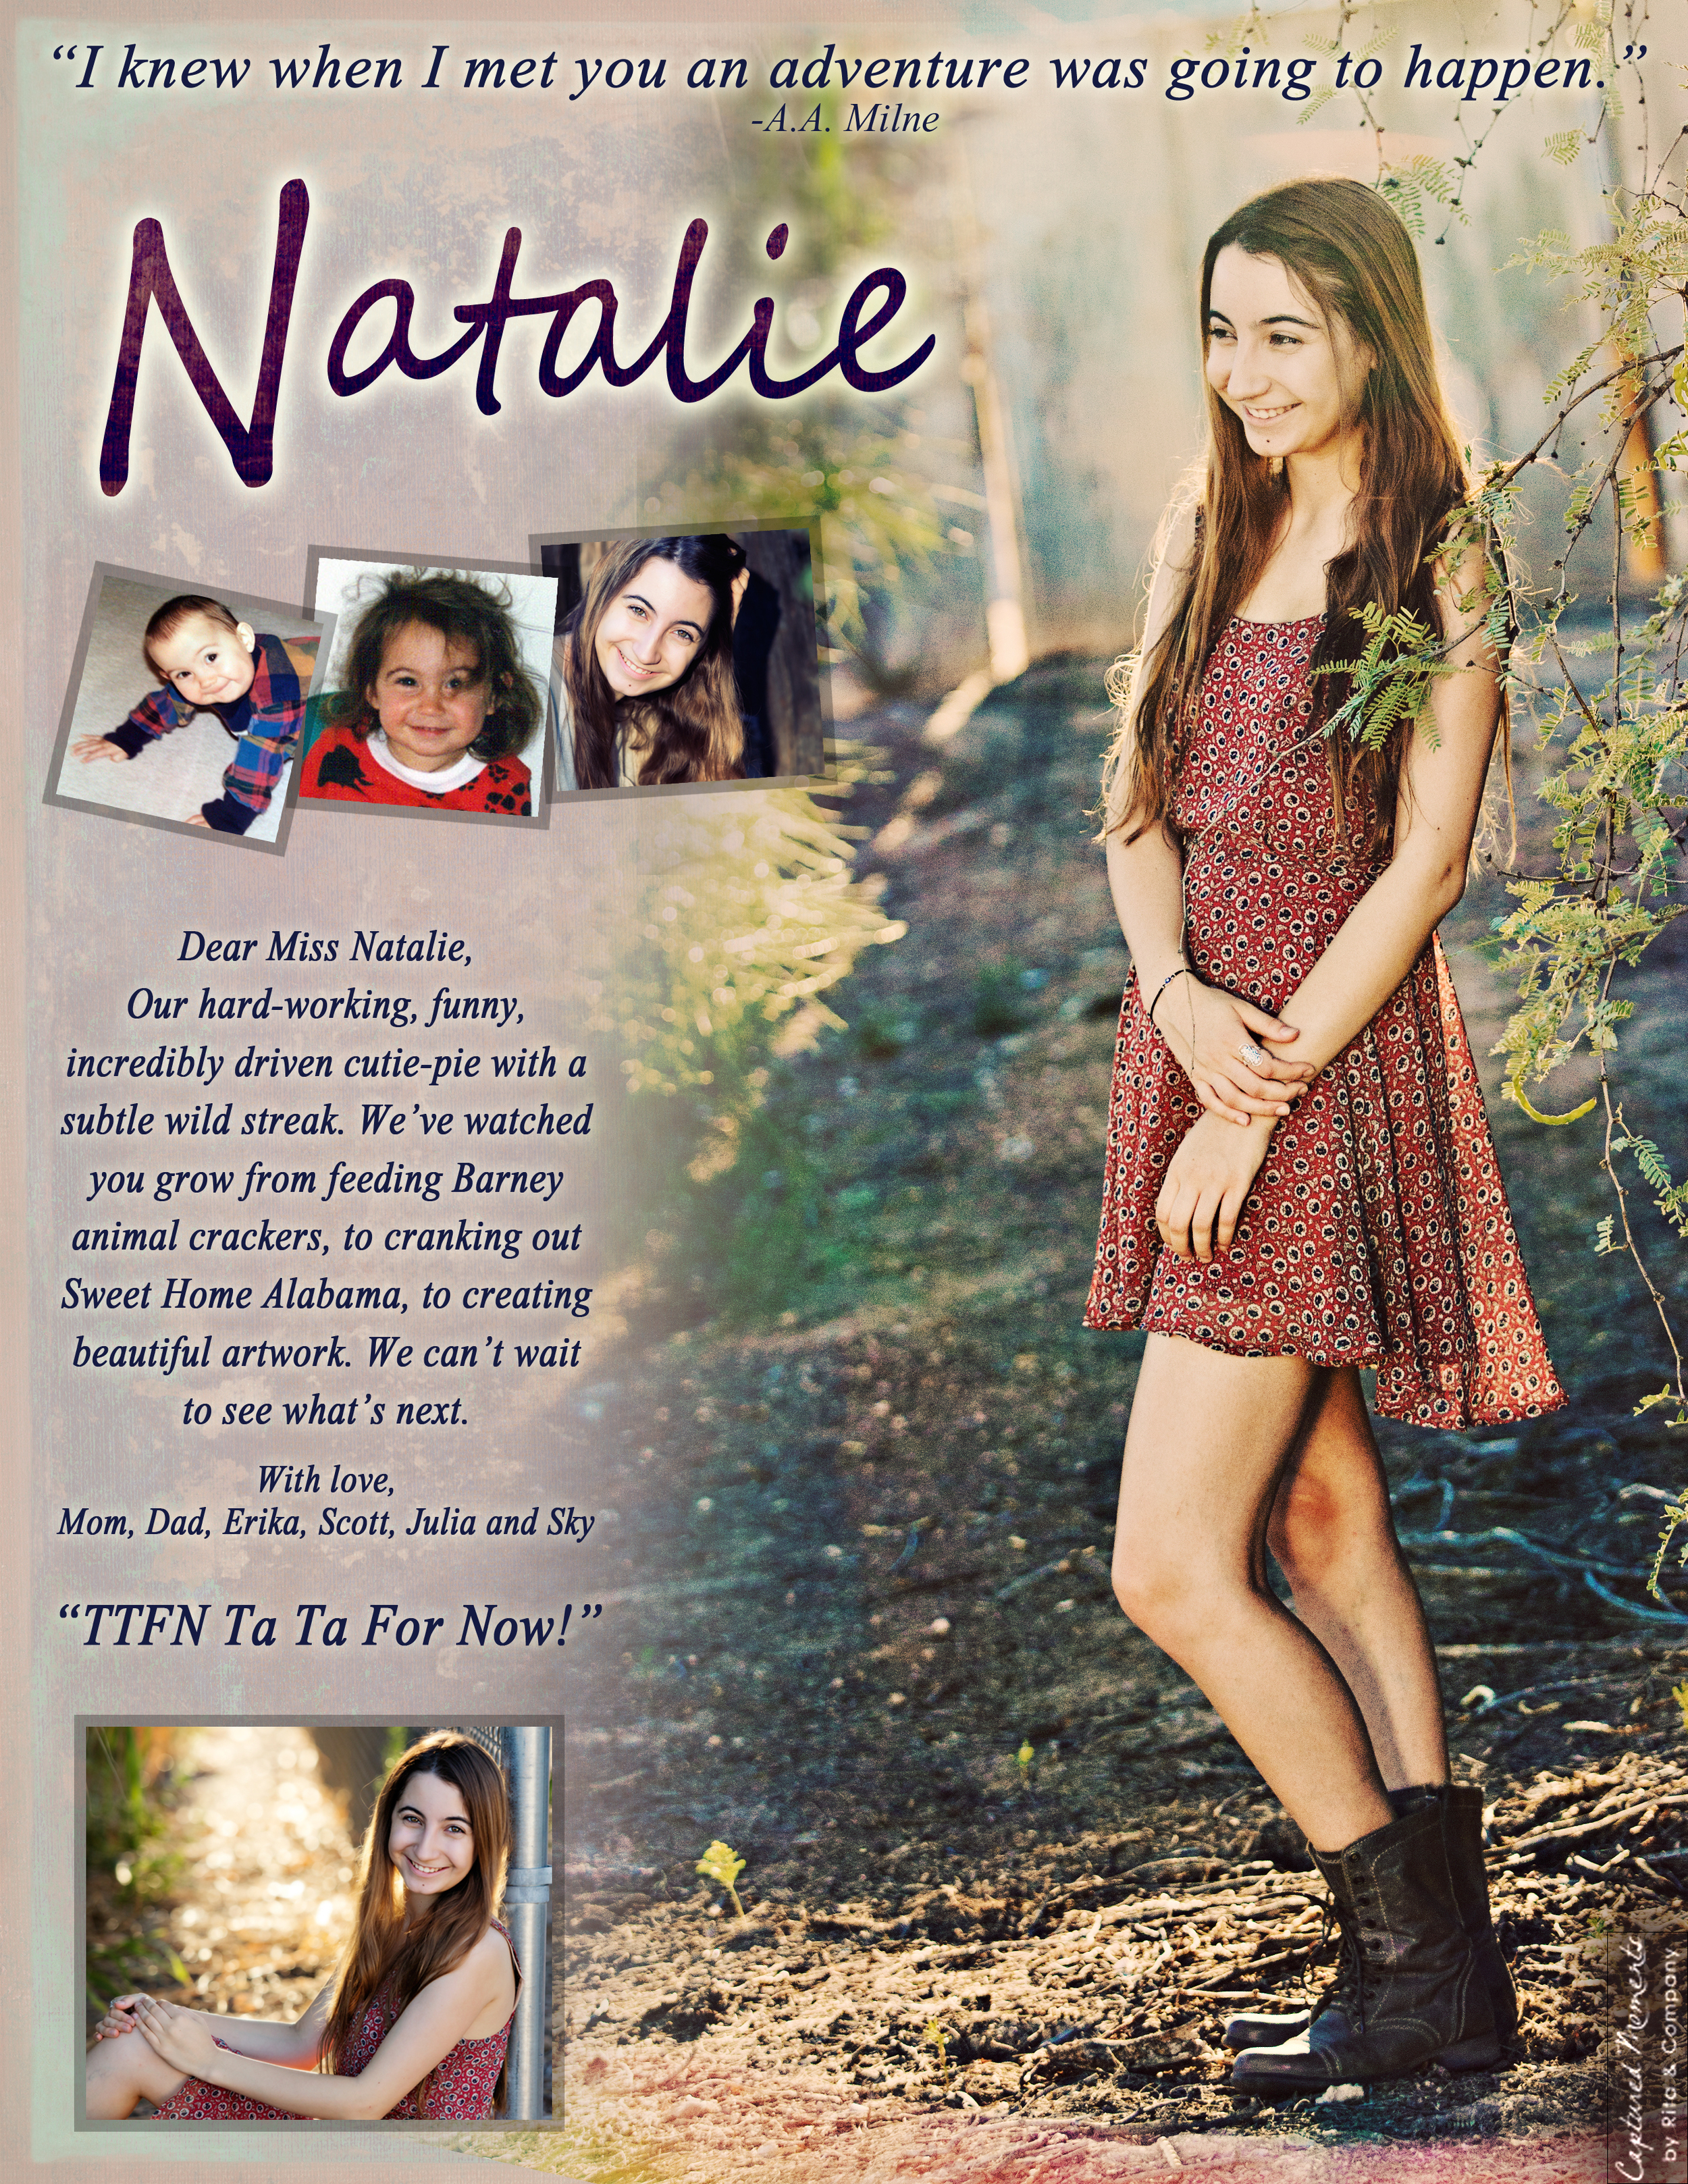 Natalie Mionis